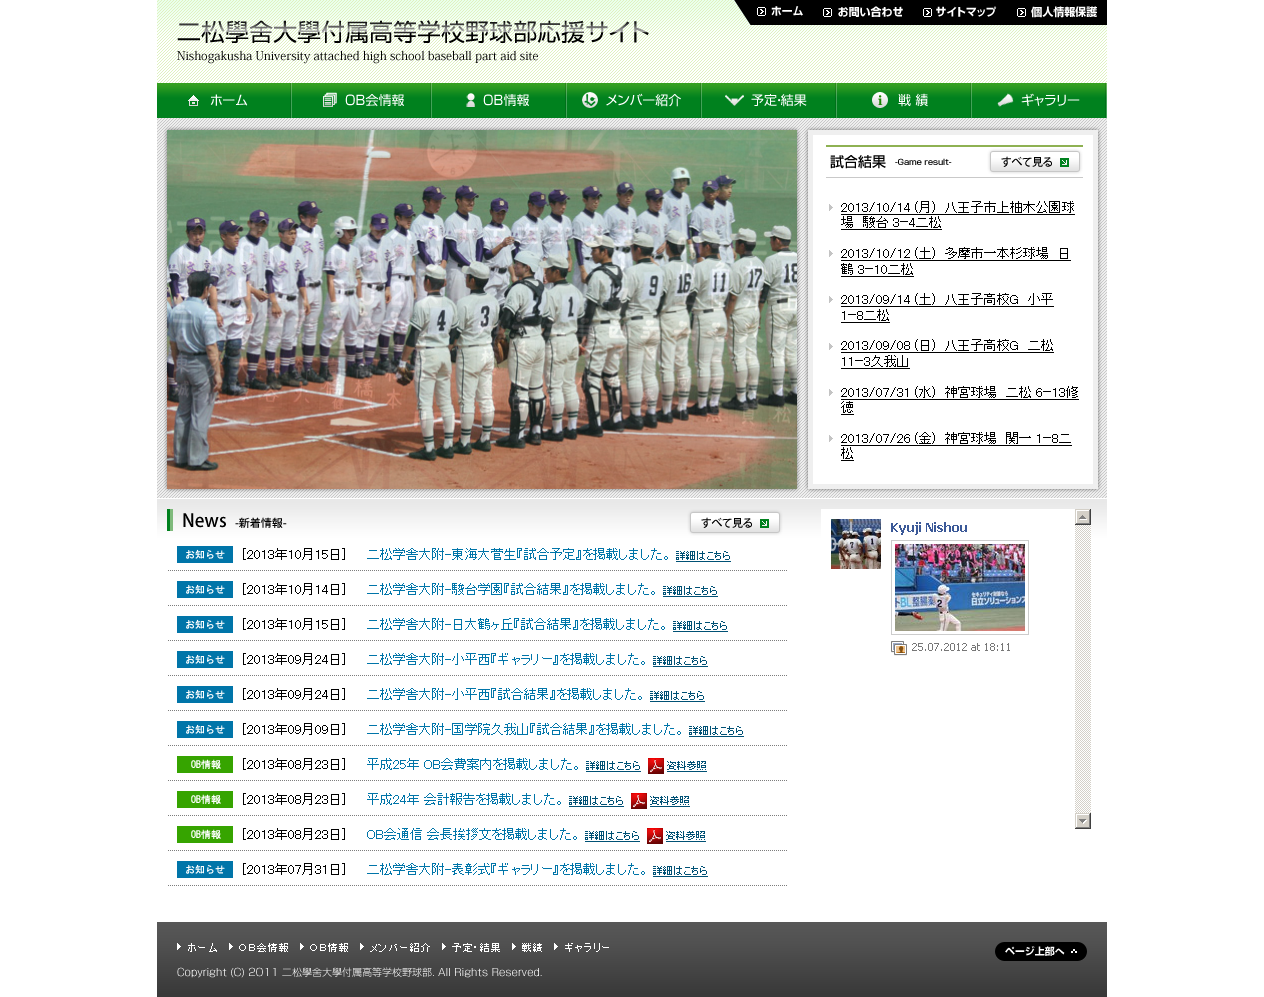 二松學舍大學付属高等学校野球部応援サイト様の実績イメージ